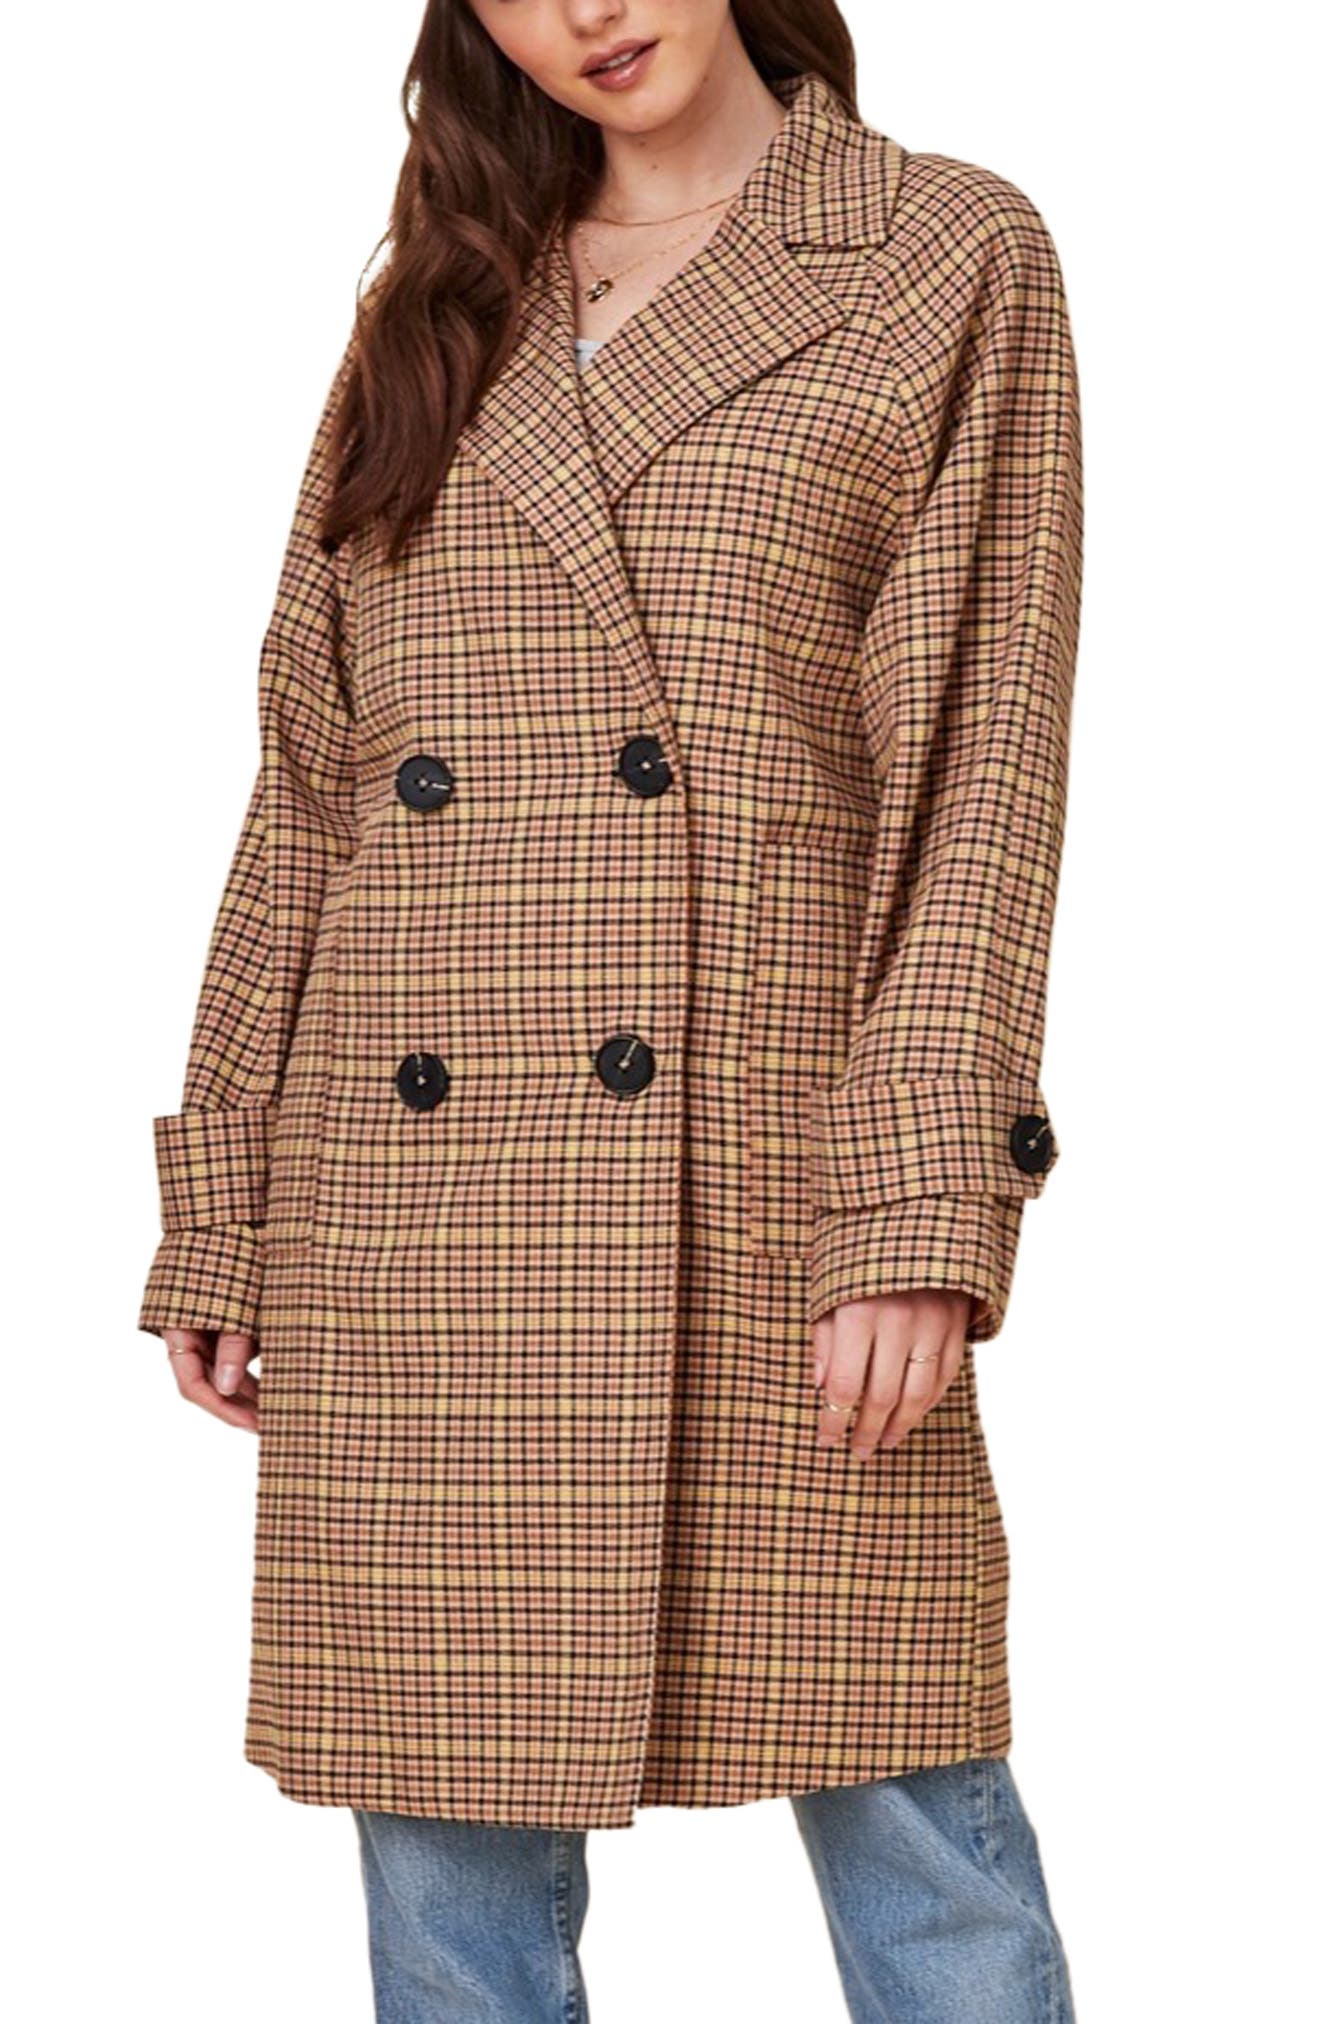 1940s Coats & Jackets Fashion History Womens Lost  Wander Tumbleweed Plaid Double Breasted Jacket $120.00 AT vintagedancer.com